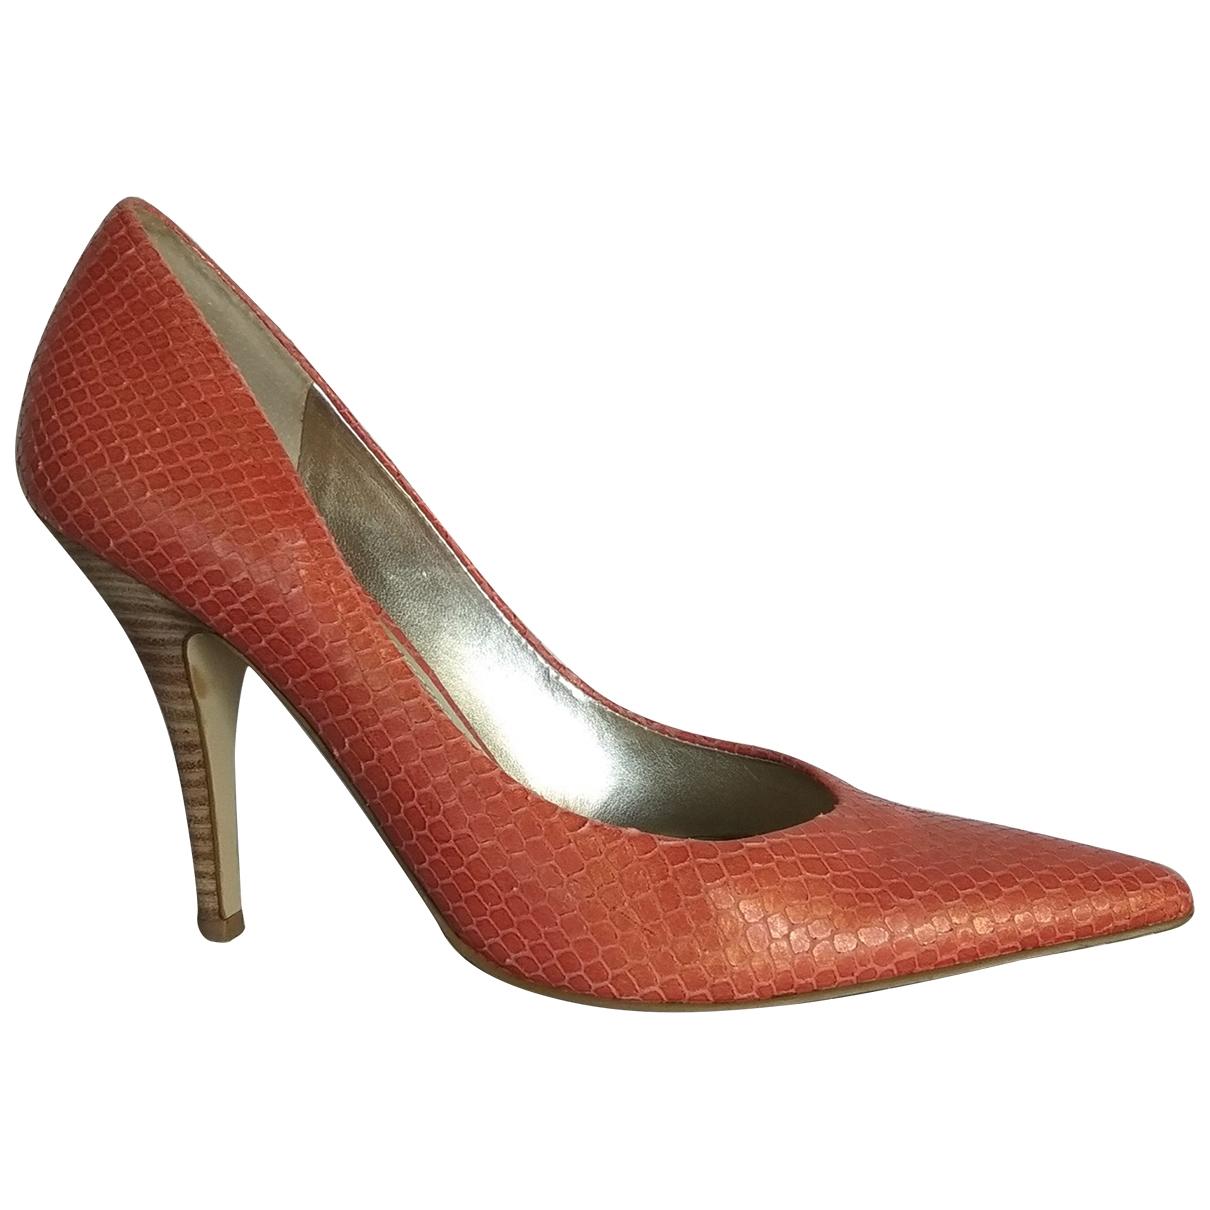 Nine West \N Leather Heels for Women 36 EU